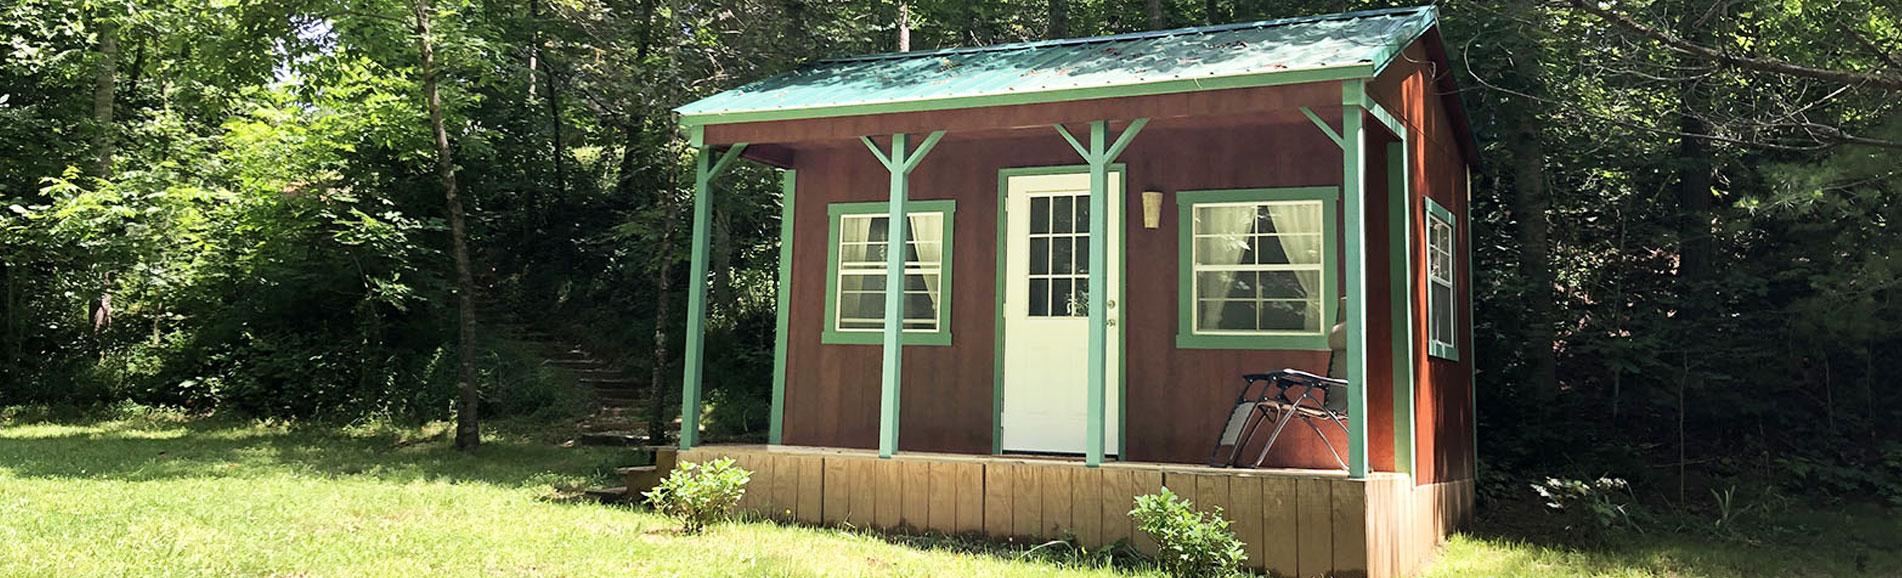 hermitage retreats in asheville